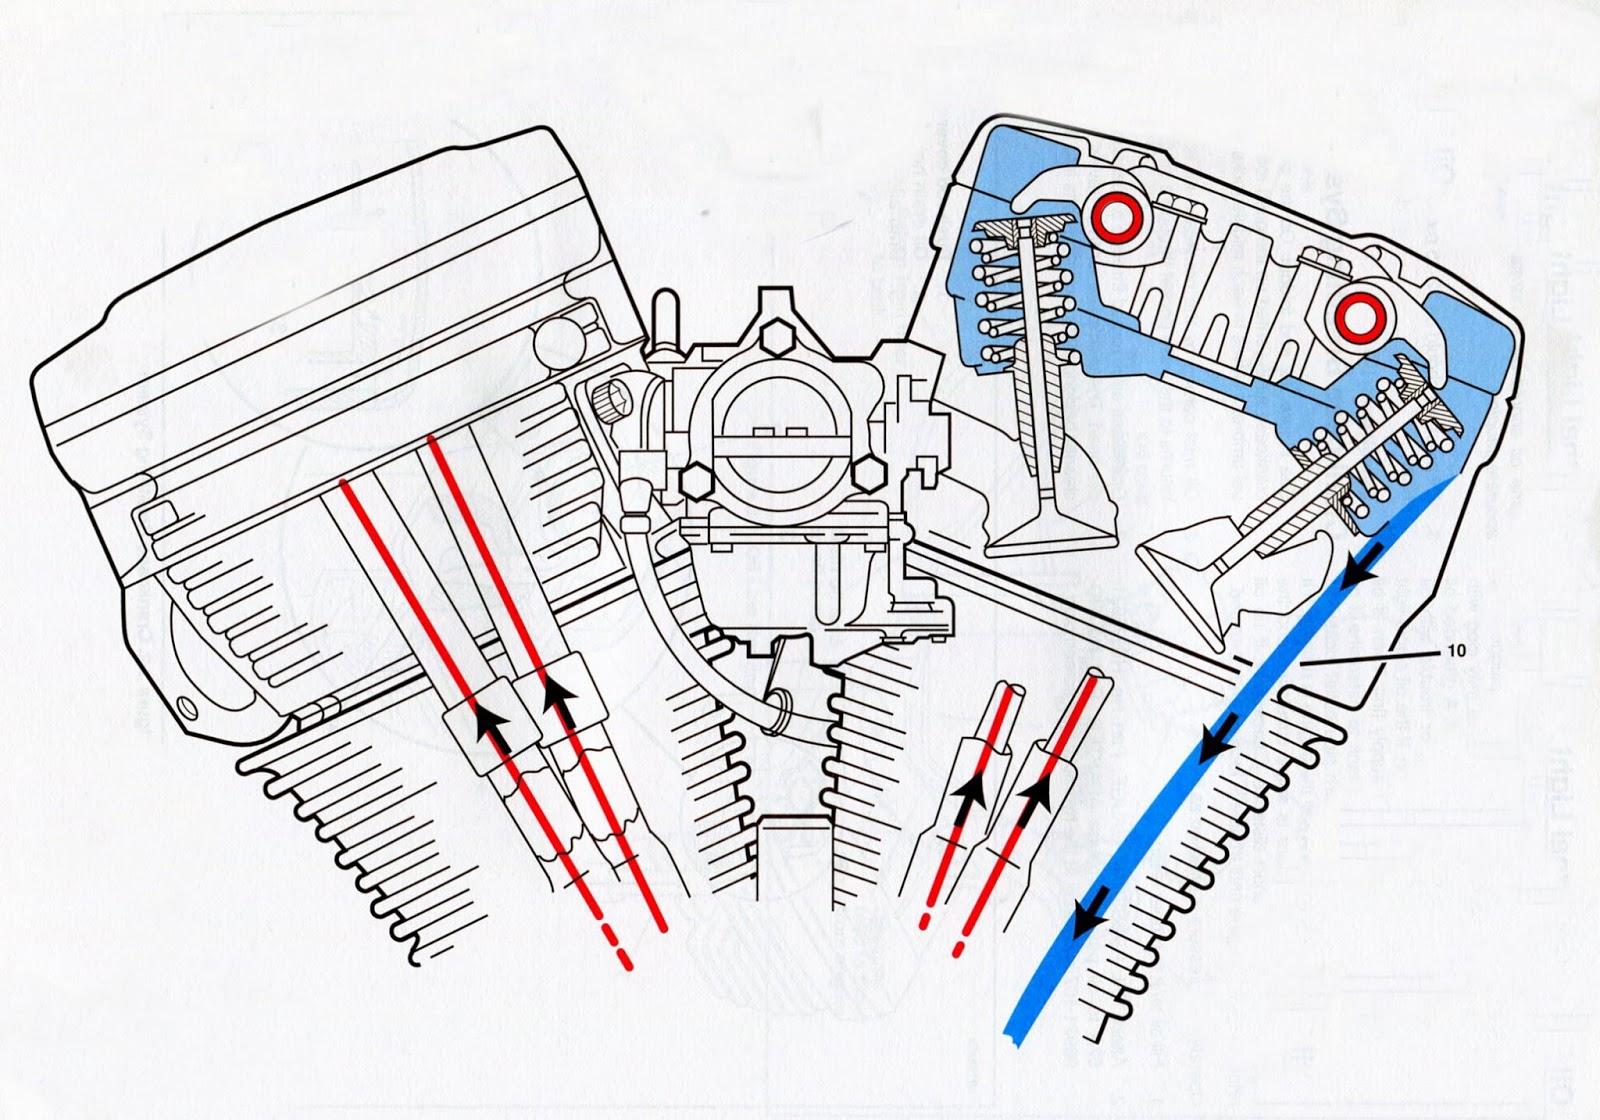 harley davidson evo engine diagram - wiring diagram dare-data-a -  dare-data-a.disnar.it  disnar.it